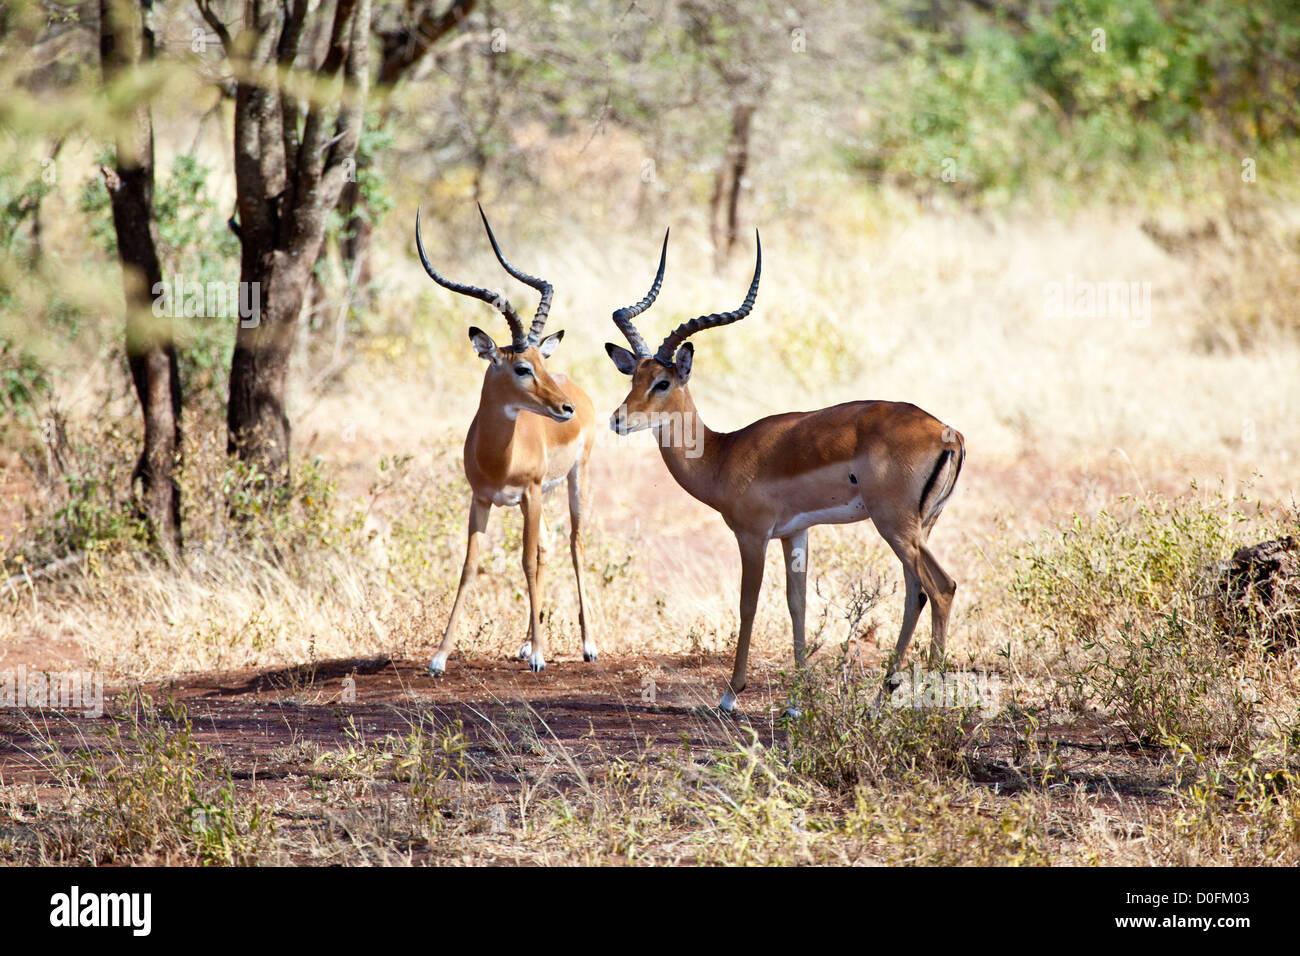 Impalas graze on the African Savannah. Serengeti National Park, Tanzania - Stock Image